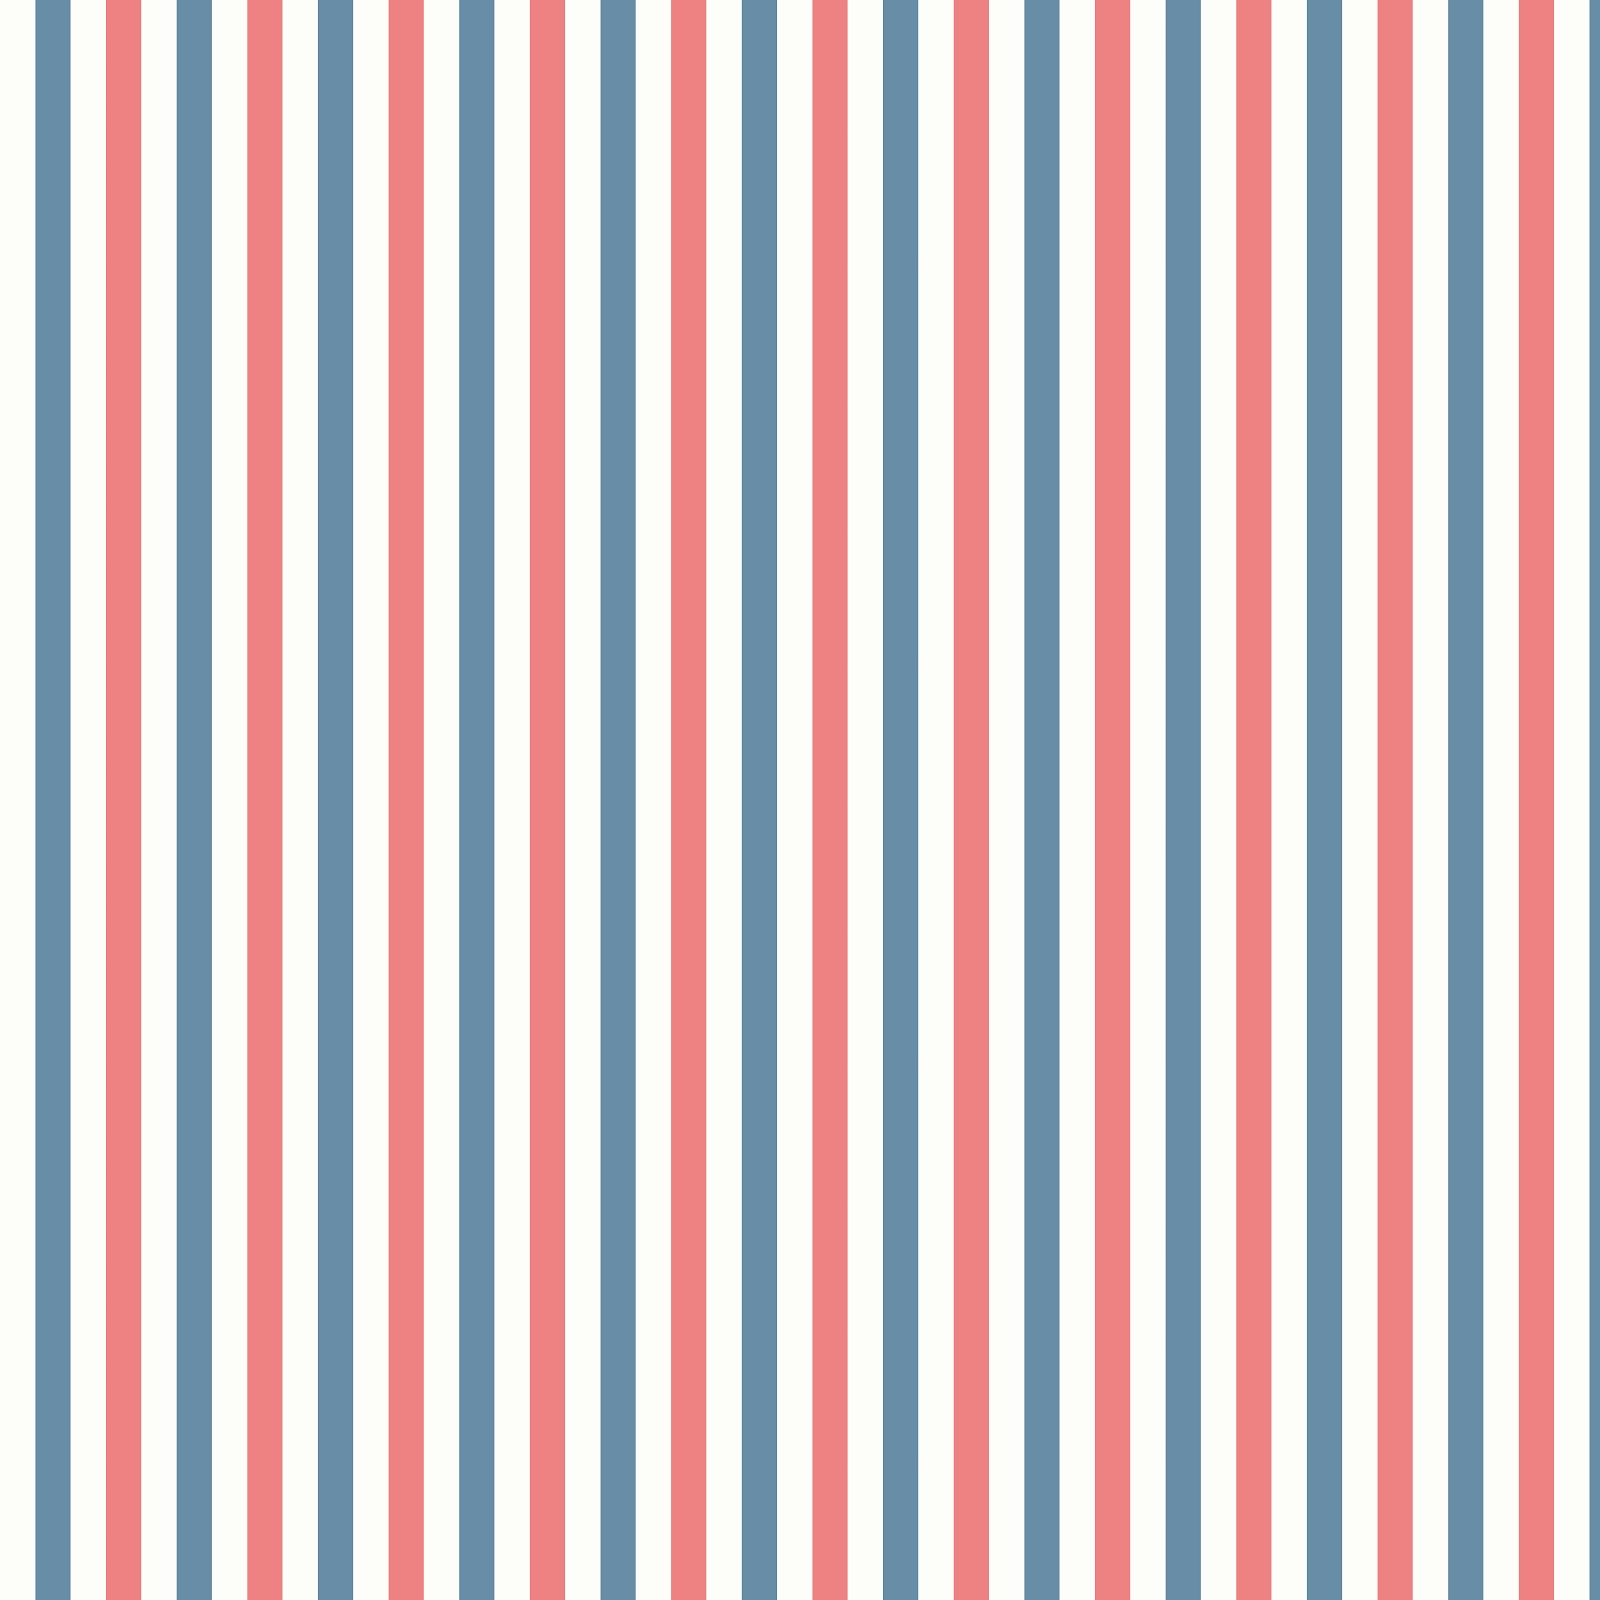 Bonjourvintage Free Digital Scrapbook Paper Red White And Blue